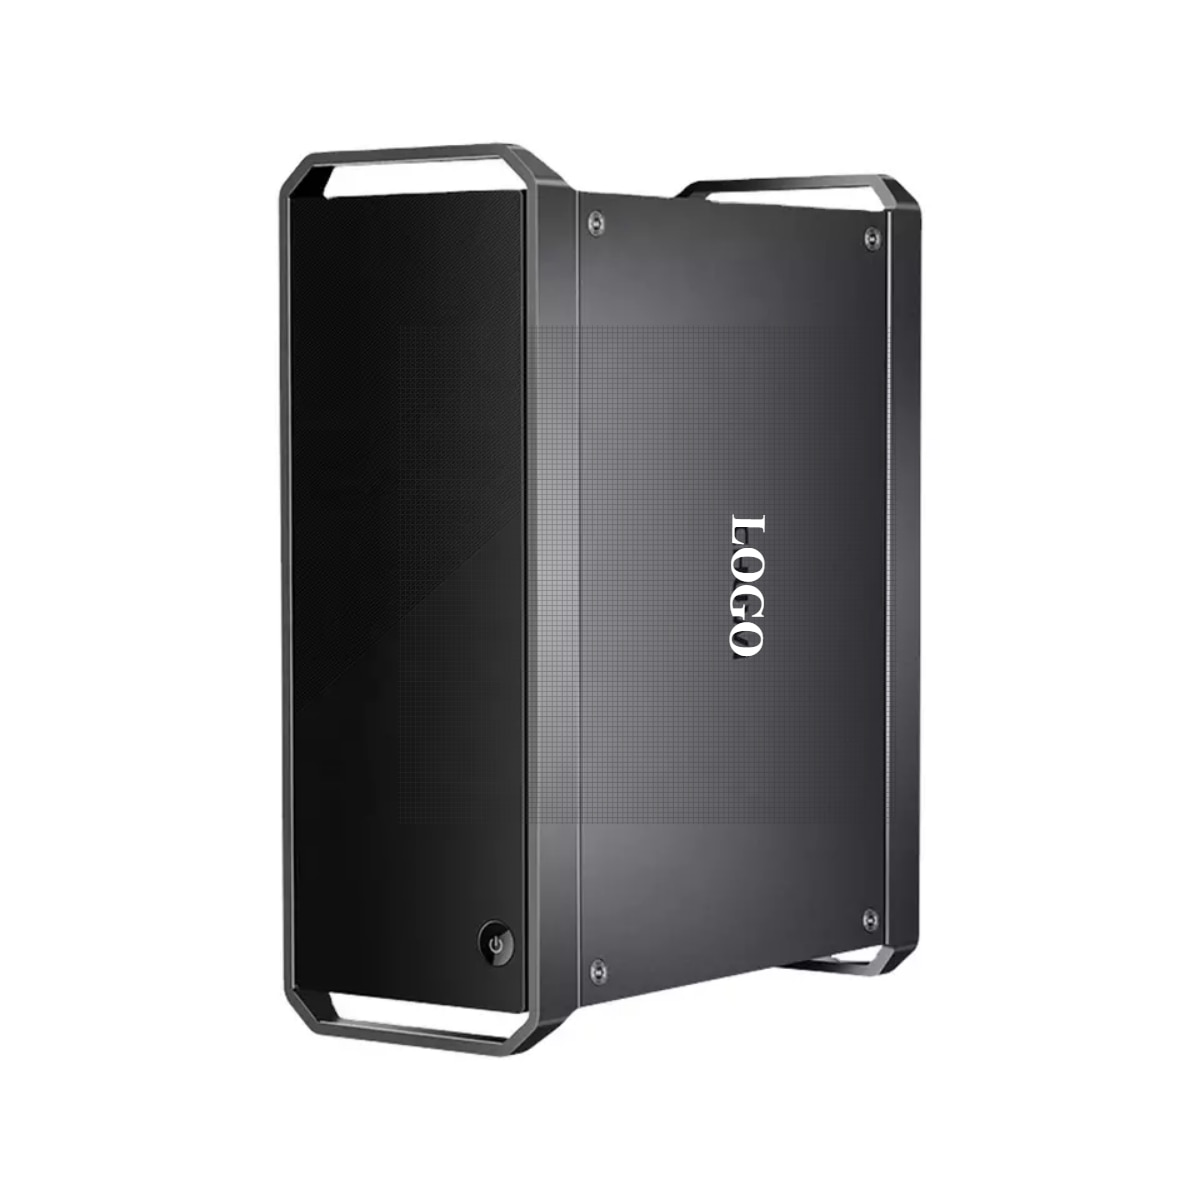 Promo Wholesale CHUWI  Mini  PC CoreBox Pocket Intel Core i5-5257U 8GB+256GB Dual Core 14nm 28W Iris Graphics 6100 Windows10 Gaming PC